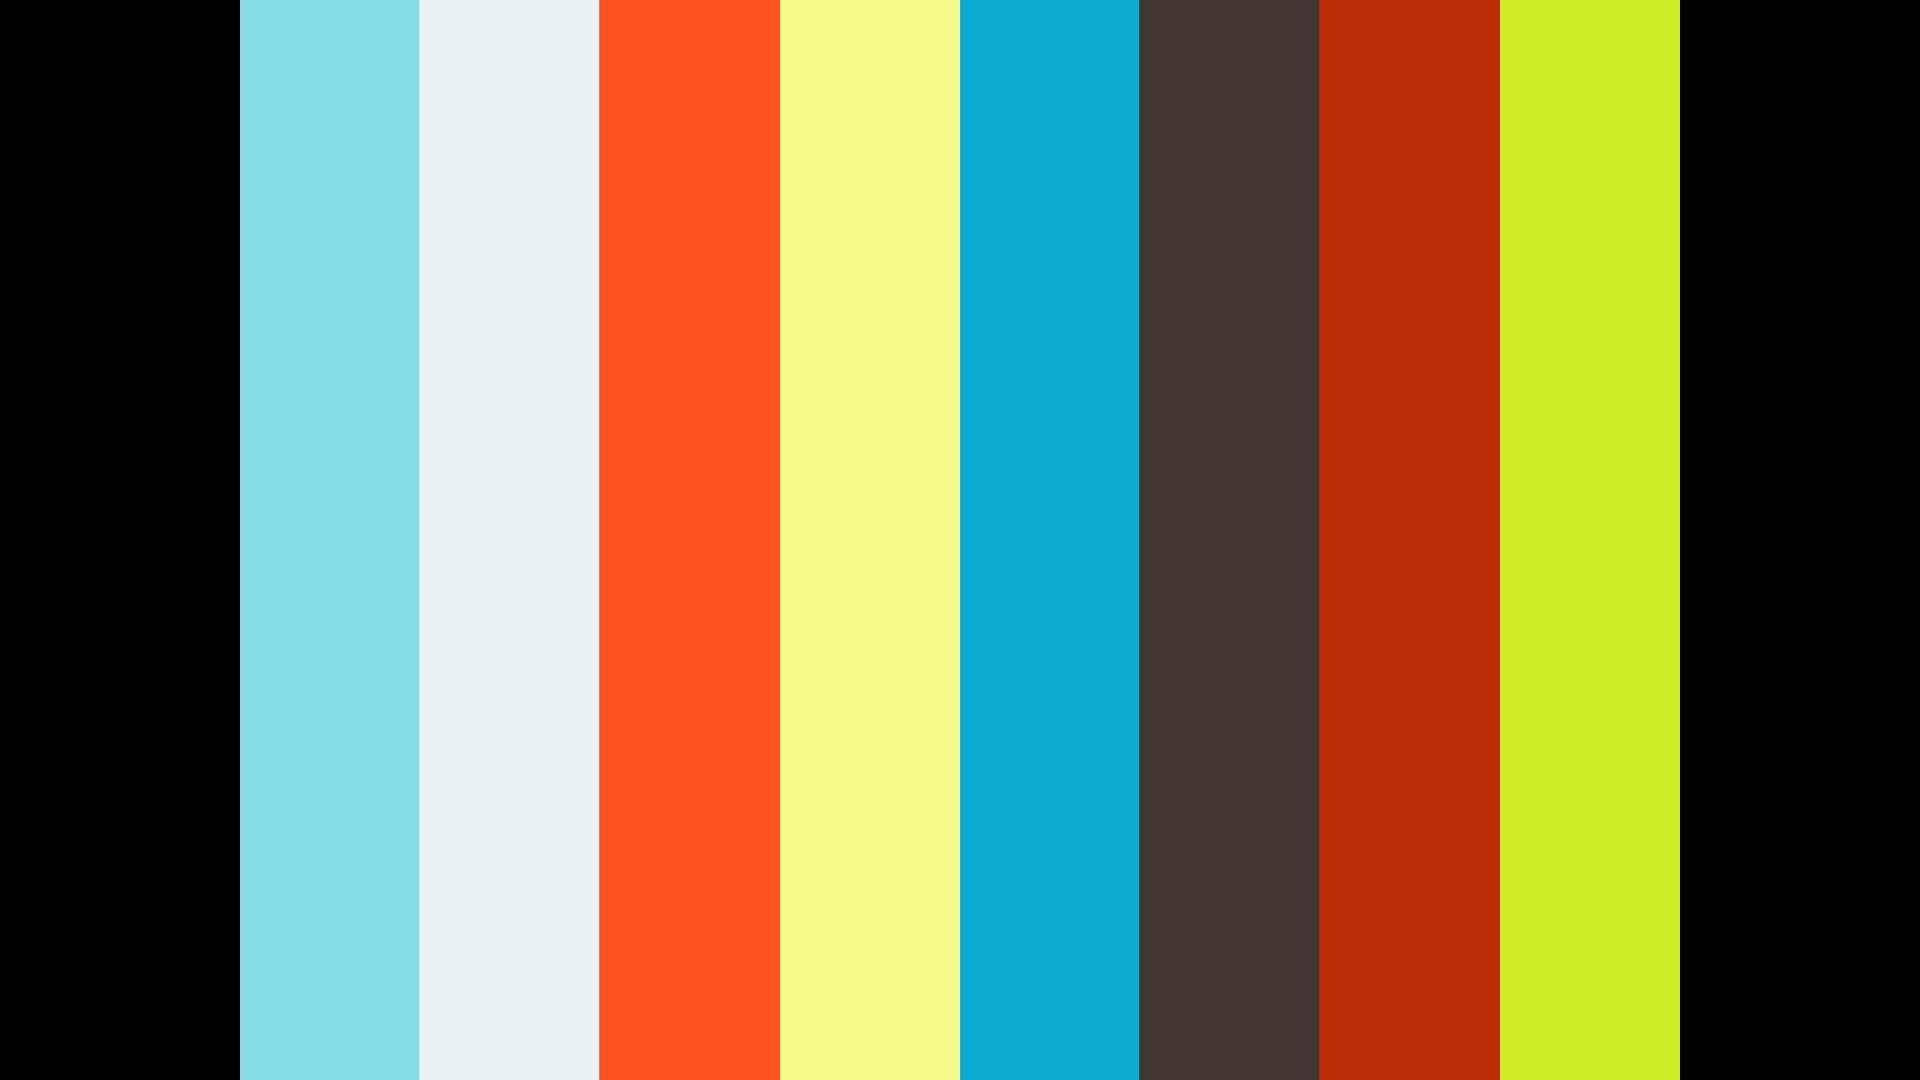 Vidéo JULIEN RAMPON - DEMO DOUBLAGE 2021